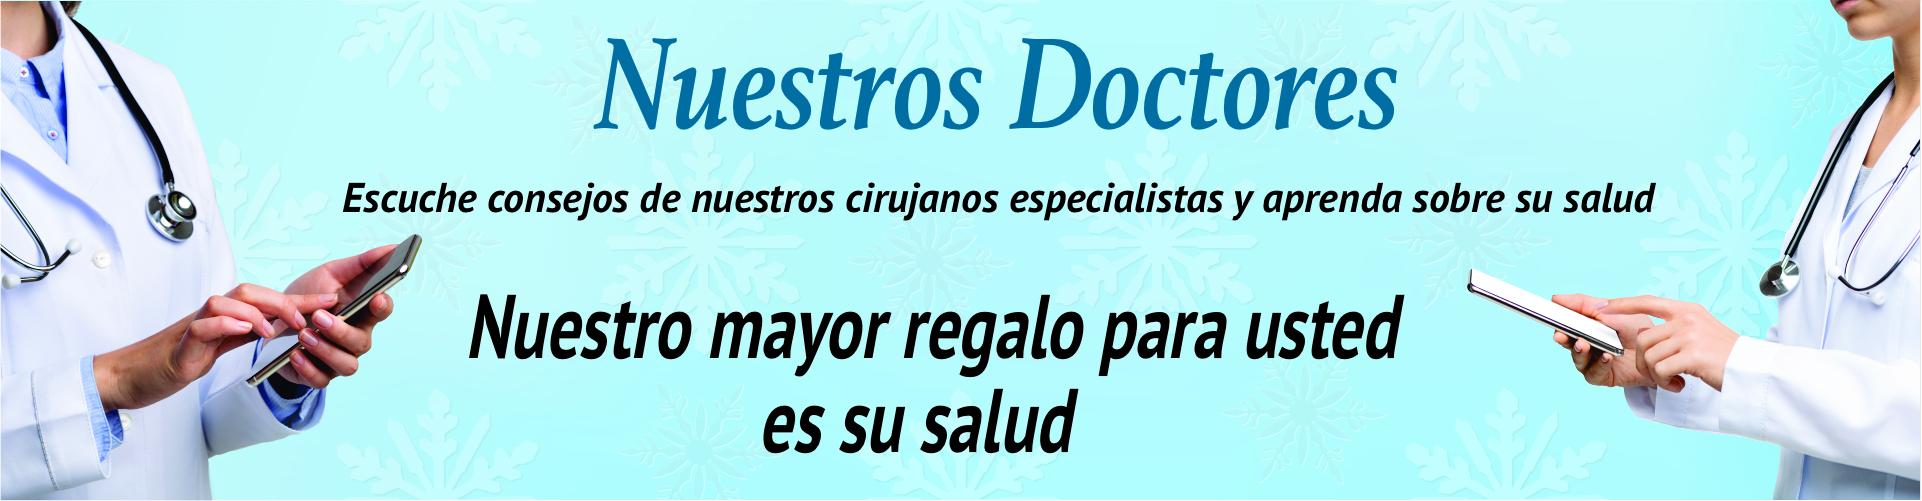 Videos Banner - Spanish